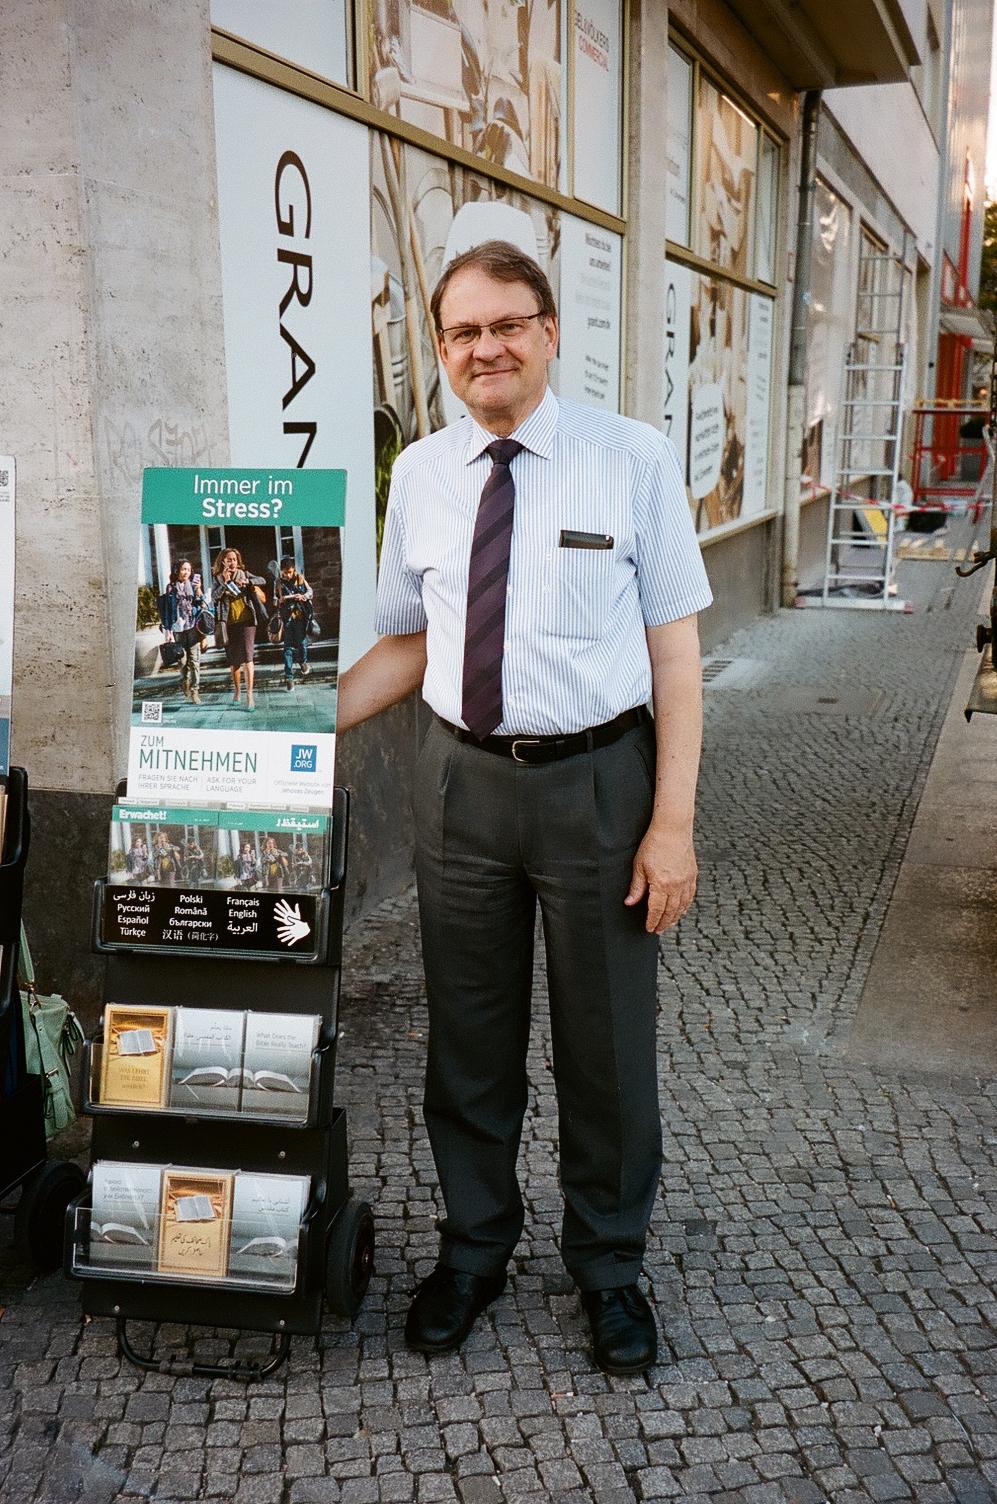 Hans-Georg, born in Berlin (Germany)